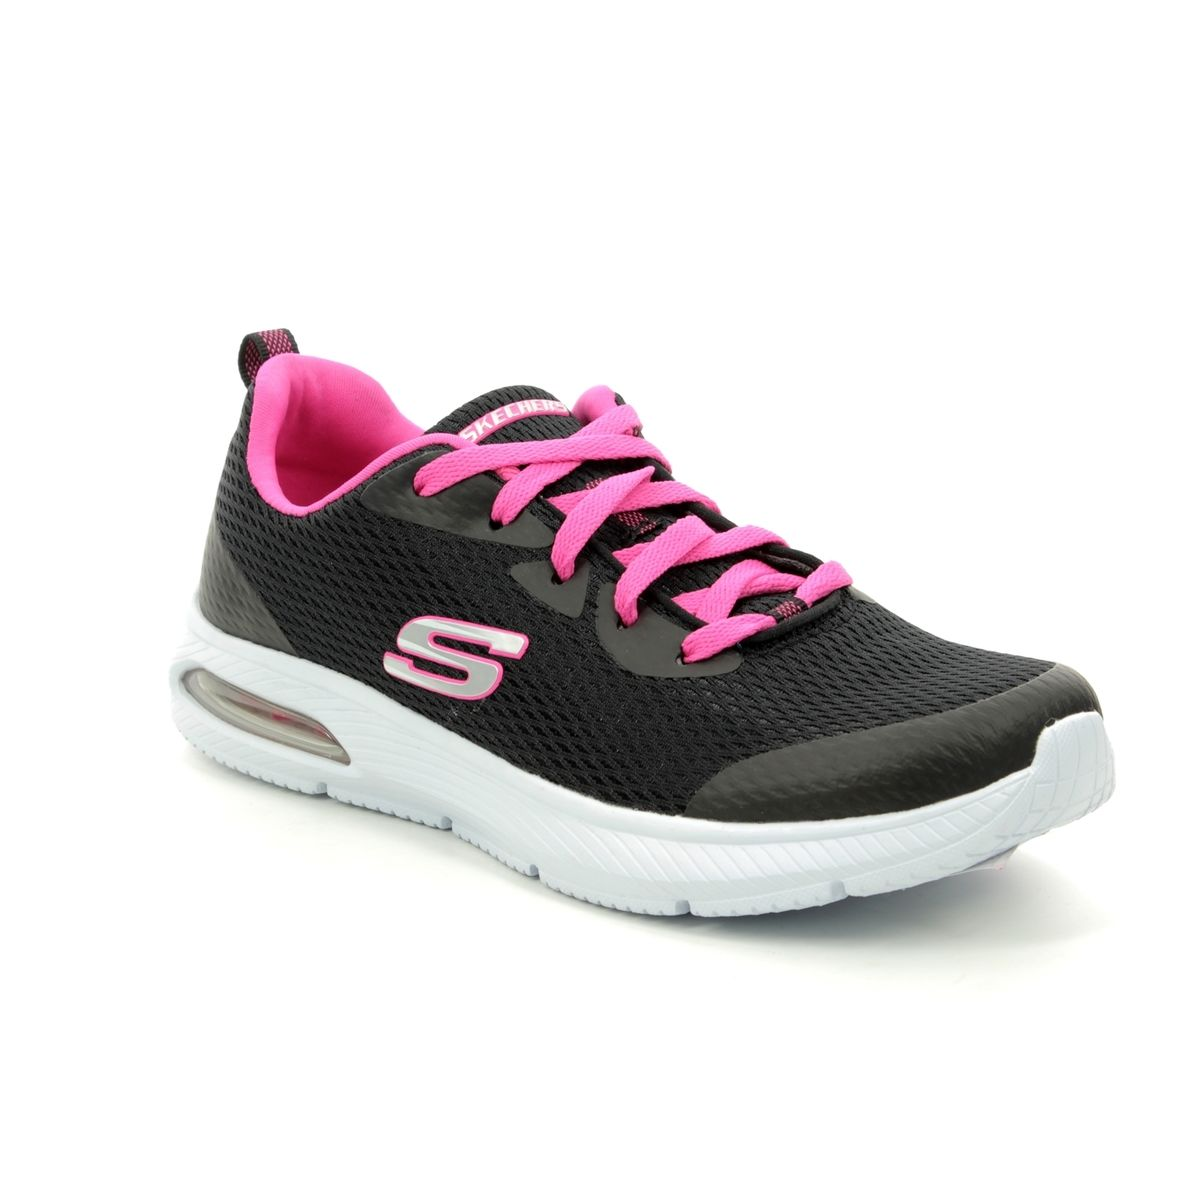 83051 Dyna air Jump Brights at Begg Shoes & Bags